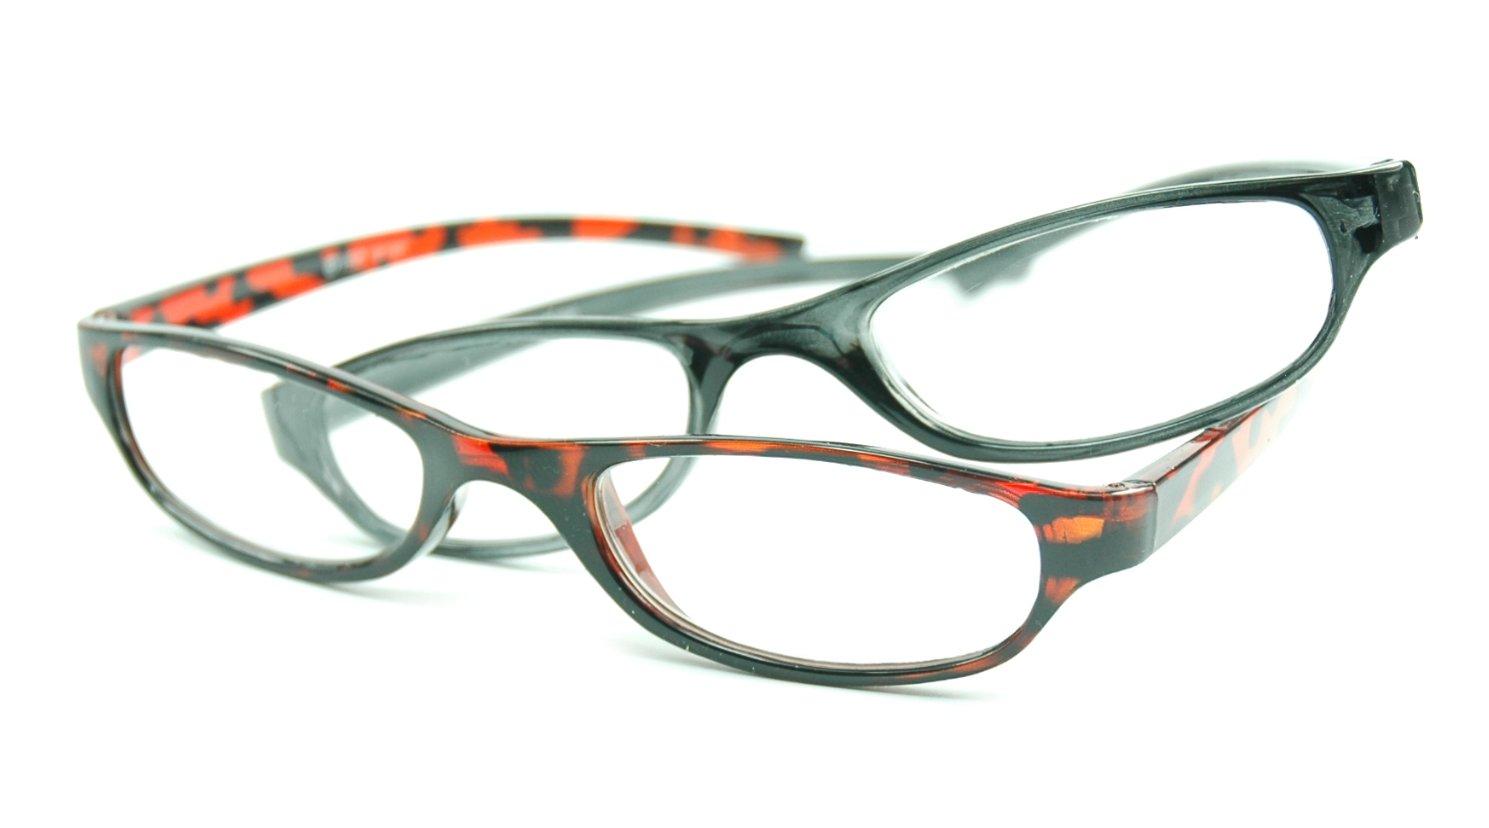 Image of Visa Reading Glasses (#111305) Brown & Grey, 2-pack